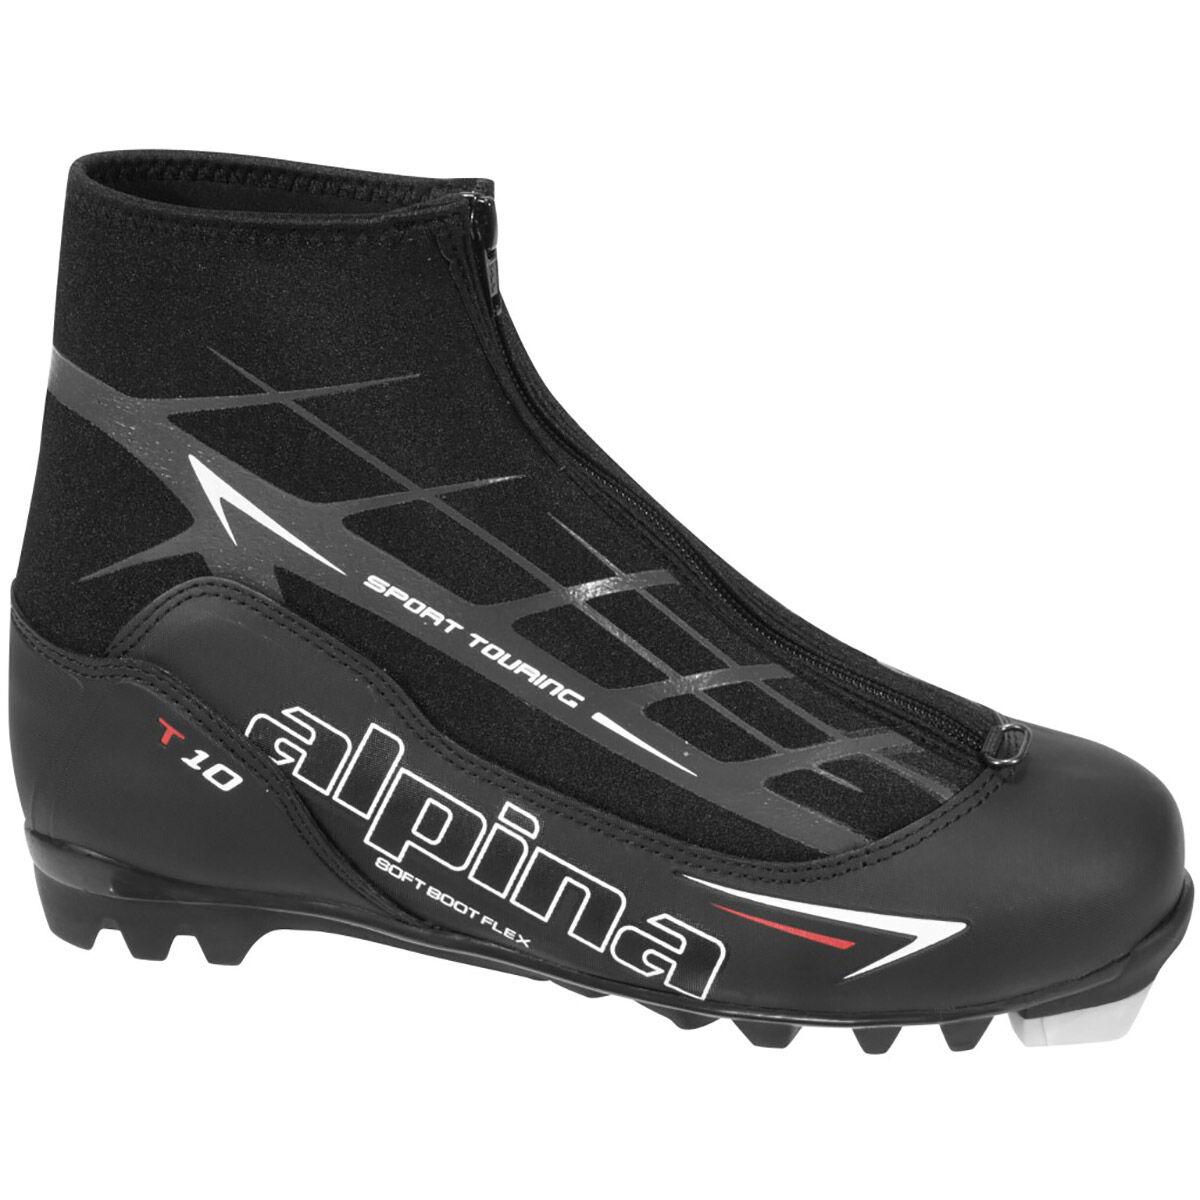 photo: Alpina T10 nordic touring boot